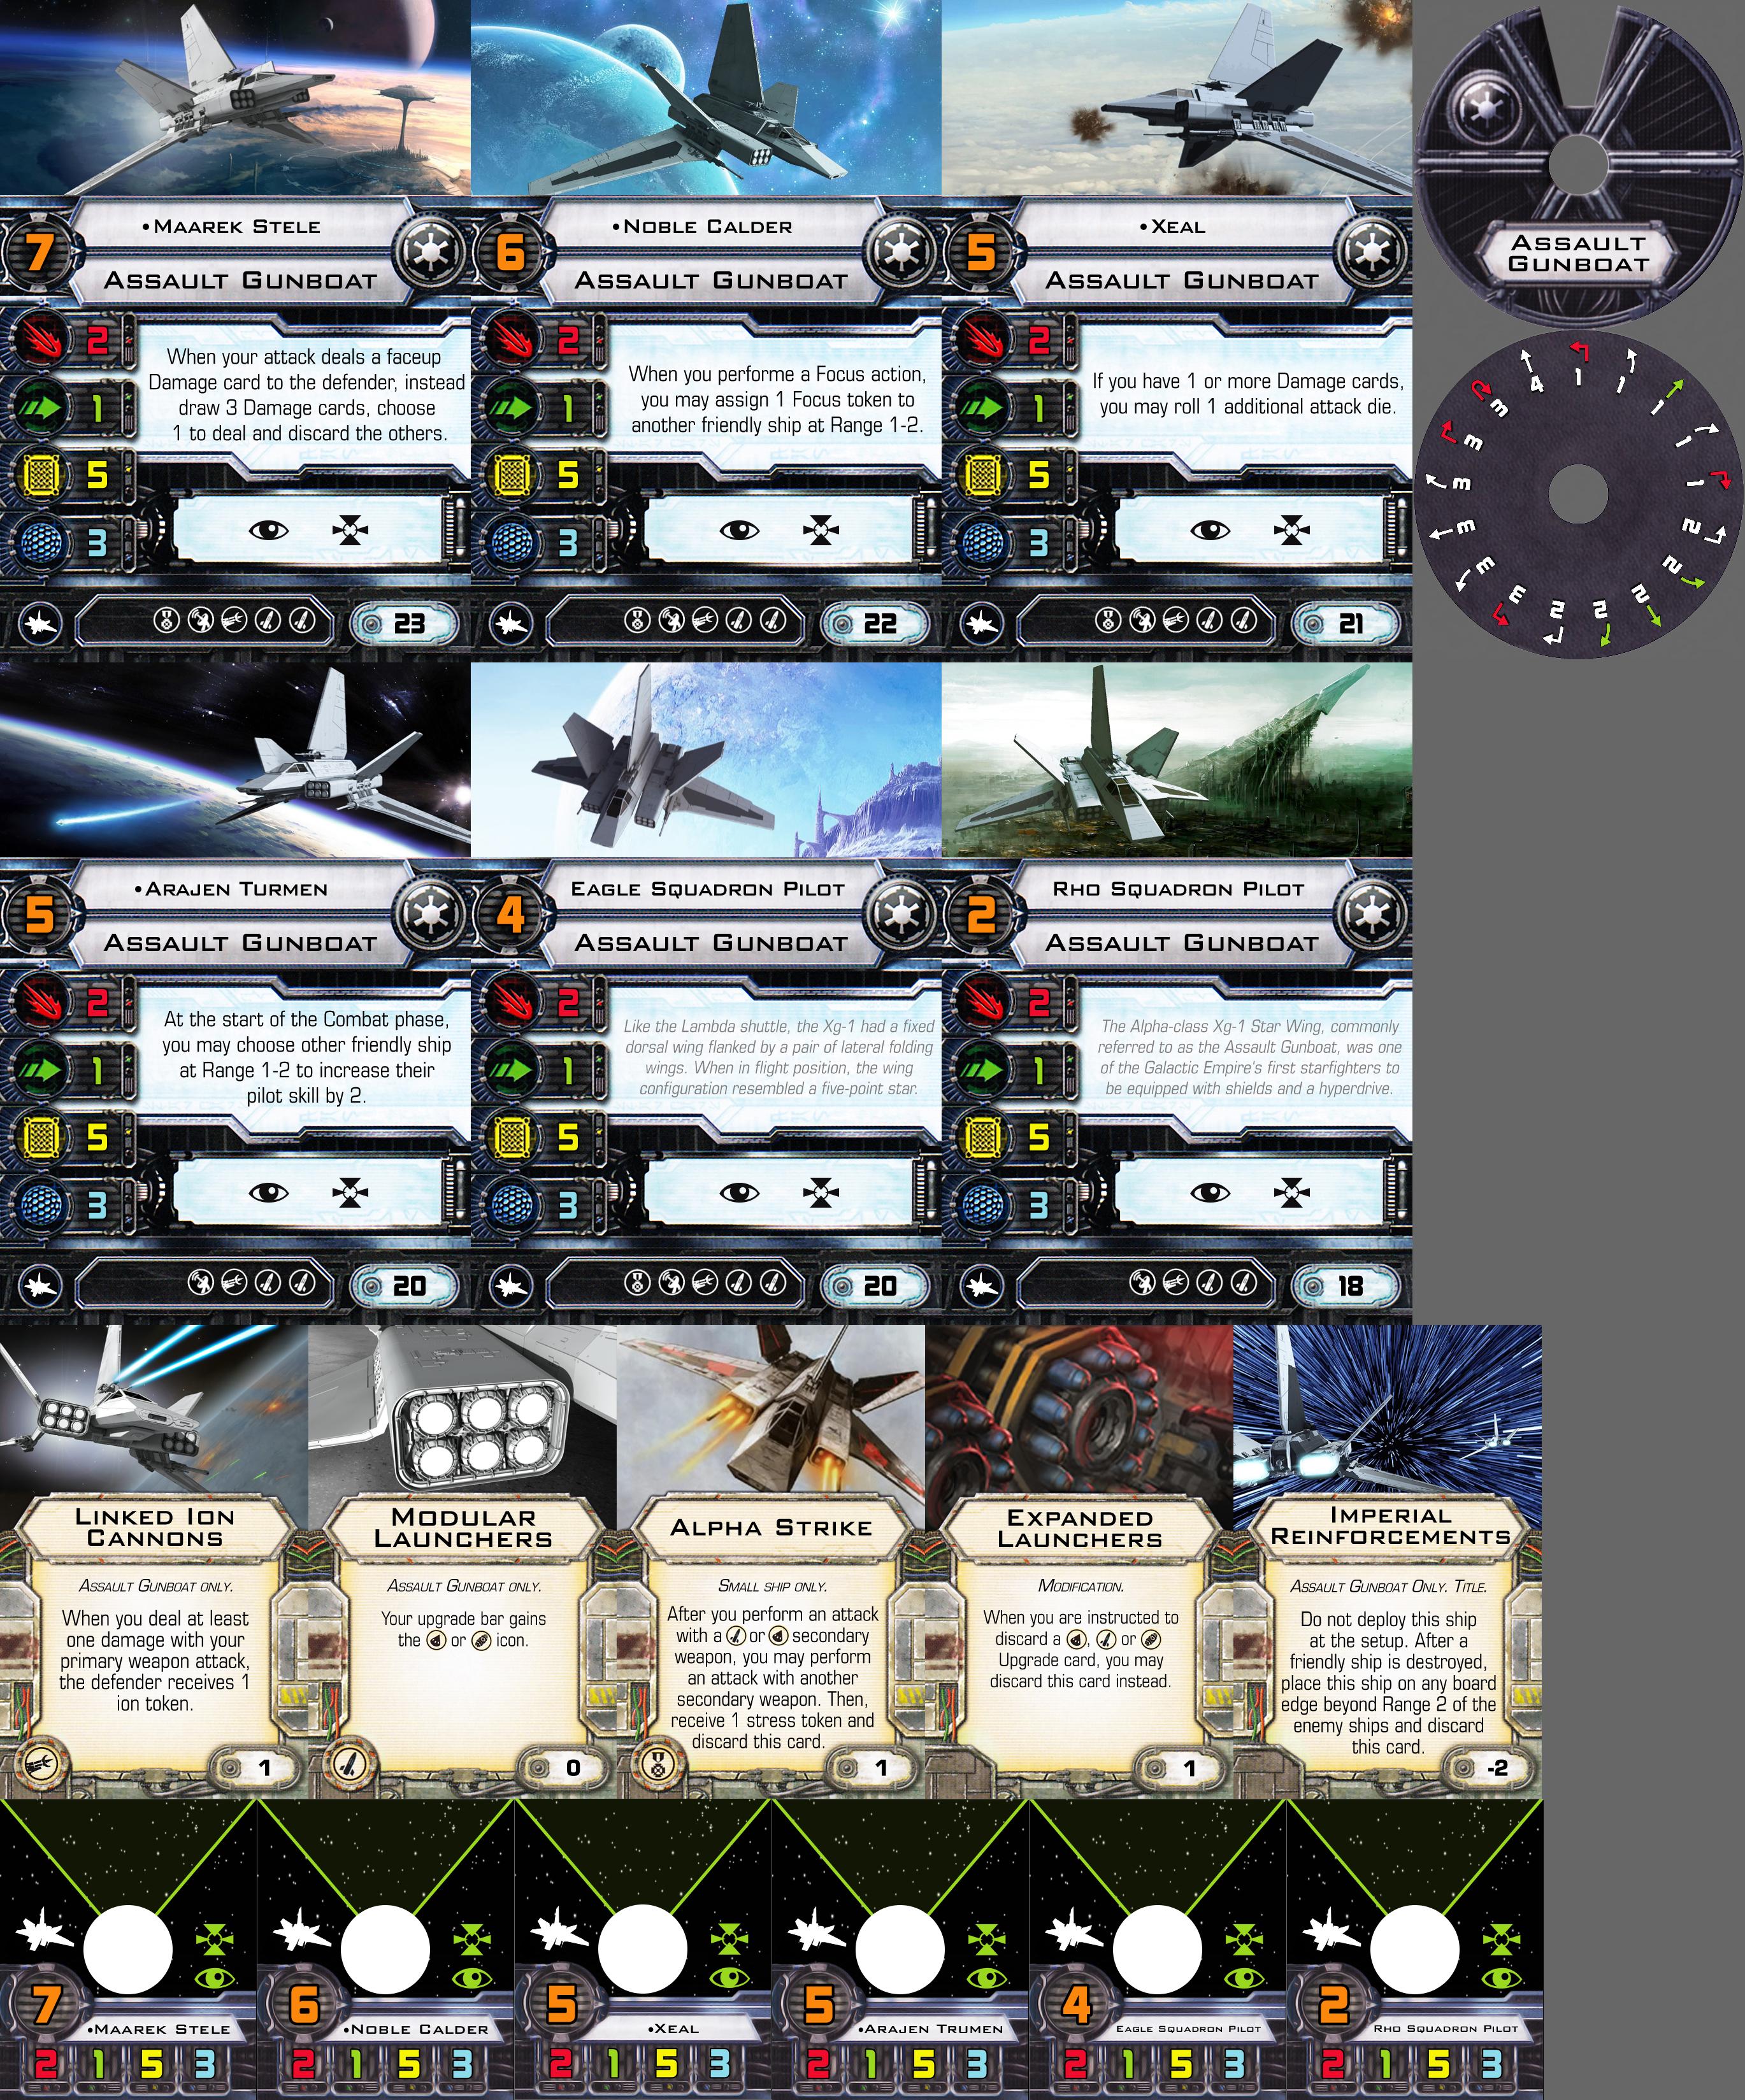 x_wing_custom_expansion_assault_gunboat_